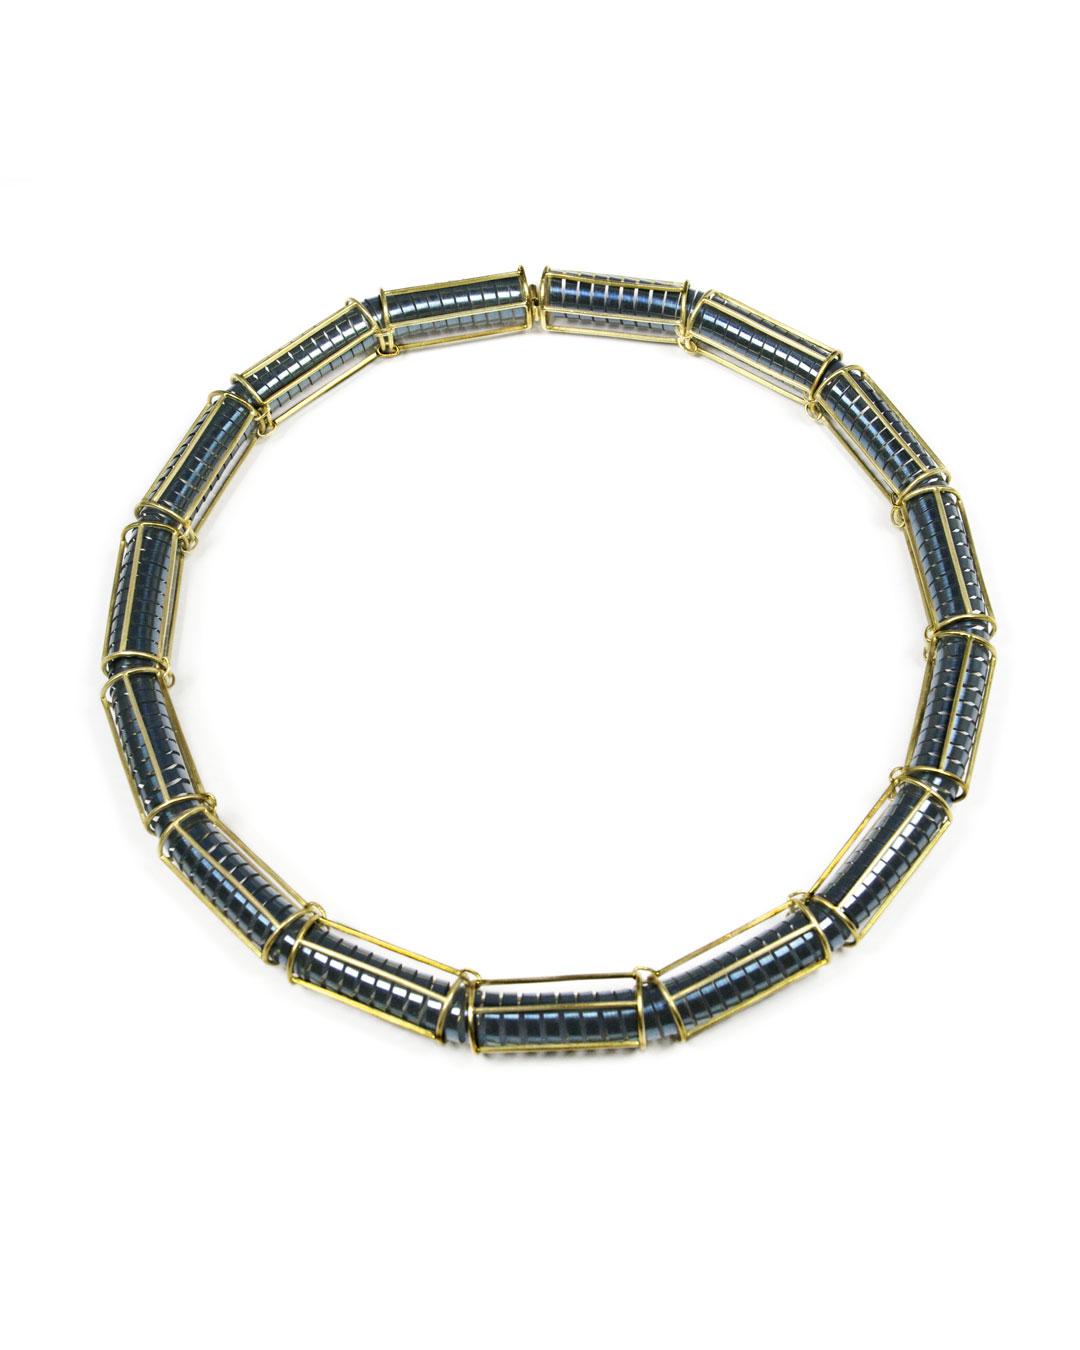 Okinari Kurokawa, untitled, 2013, necklace; 18ct gold, stainless steel, 220 x 220 x 14 mm, price on request